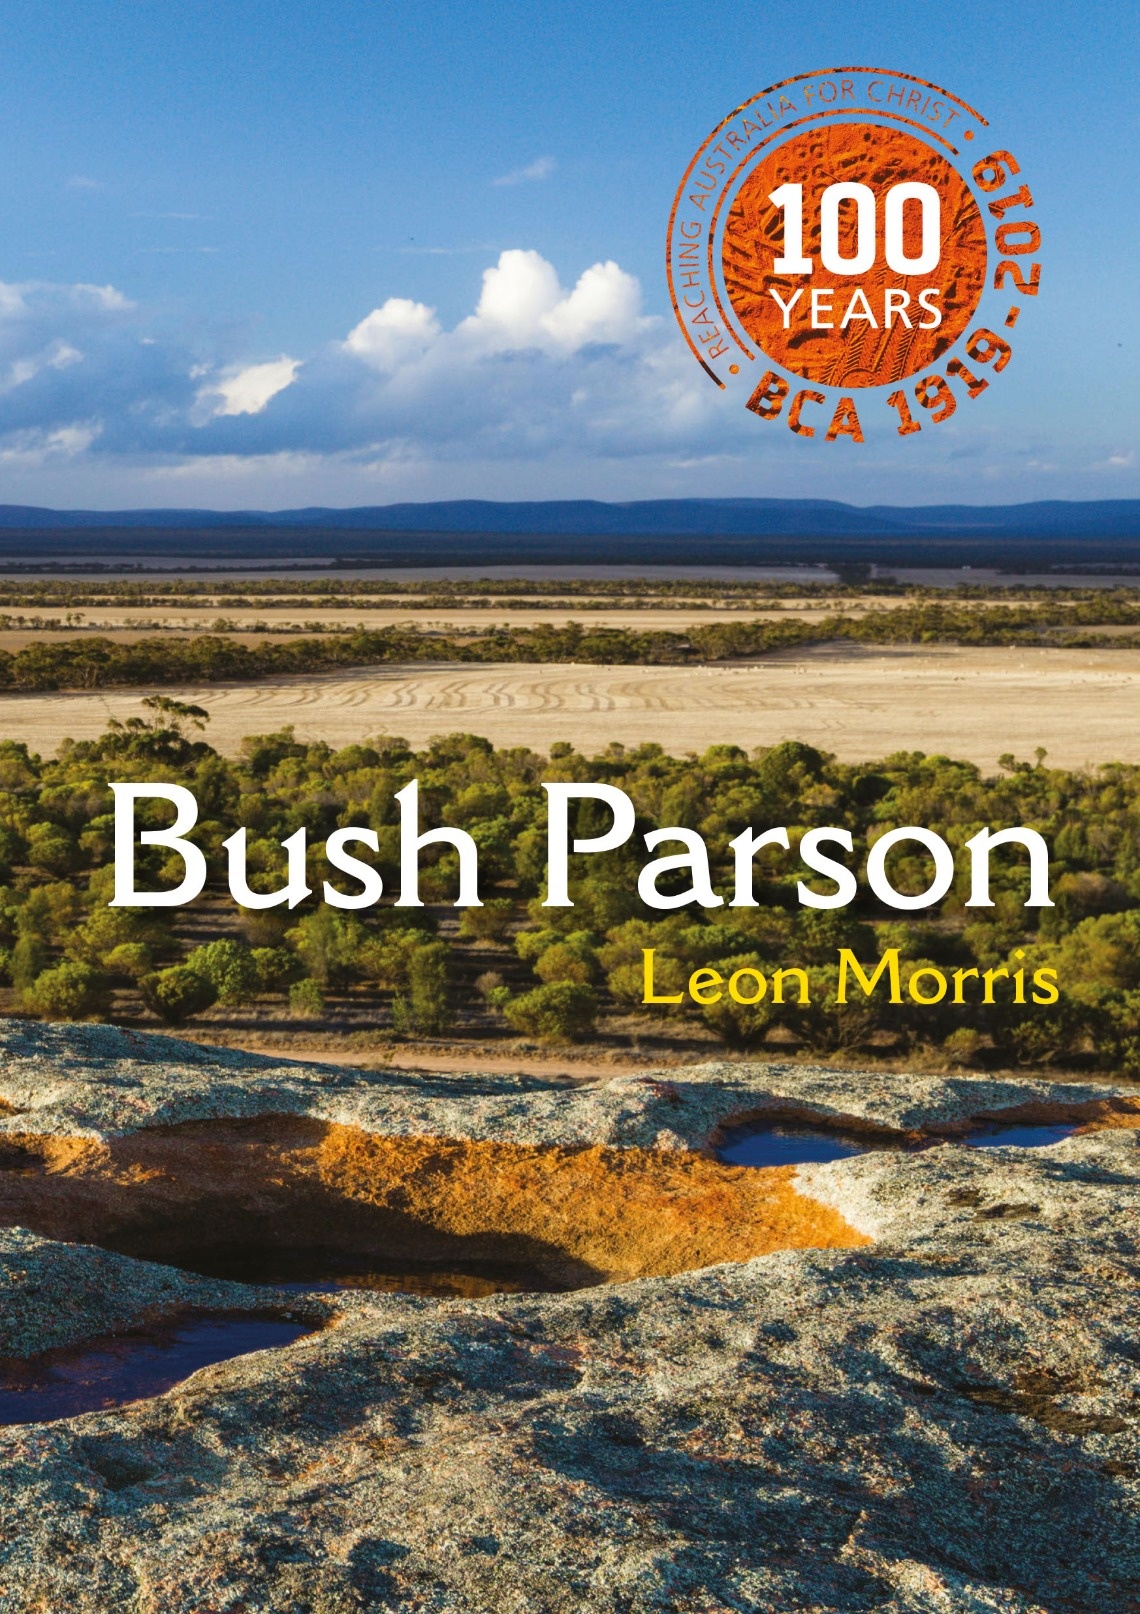 Bush Parson